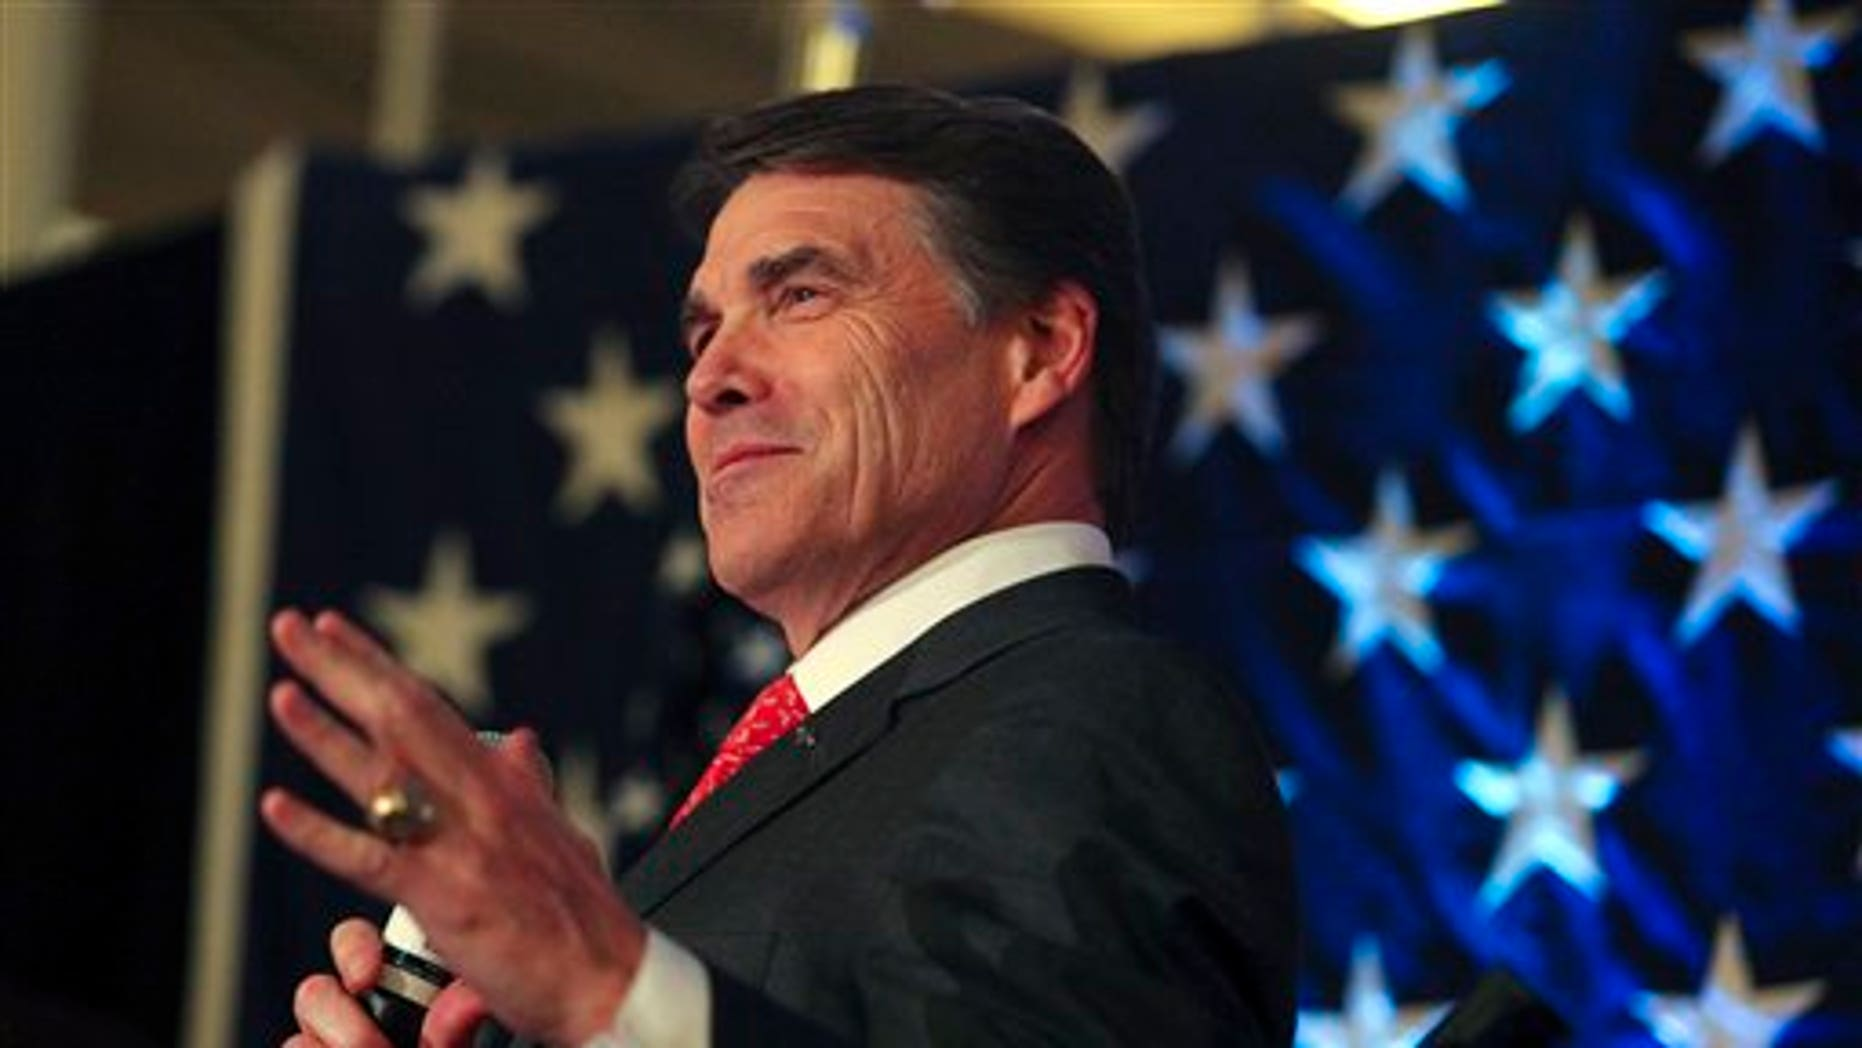 Texas Governor Rick Perry